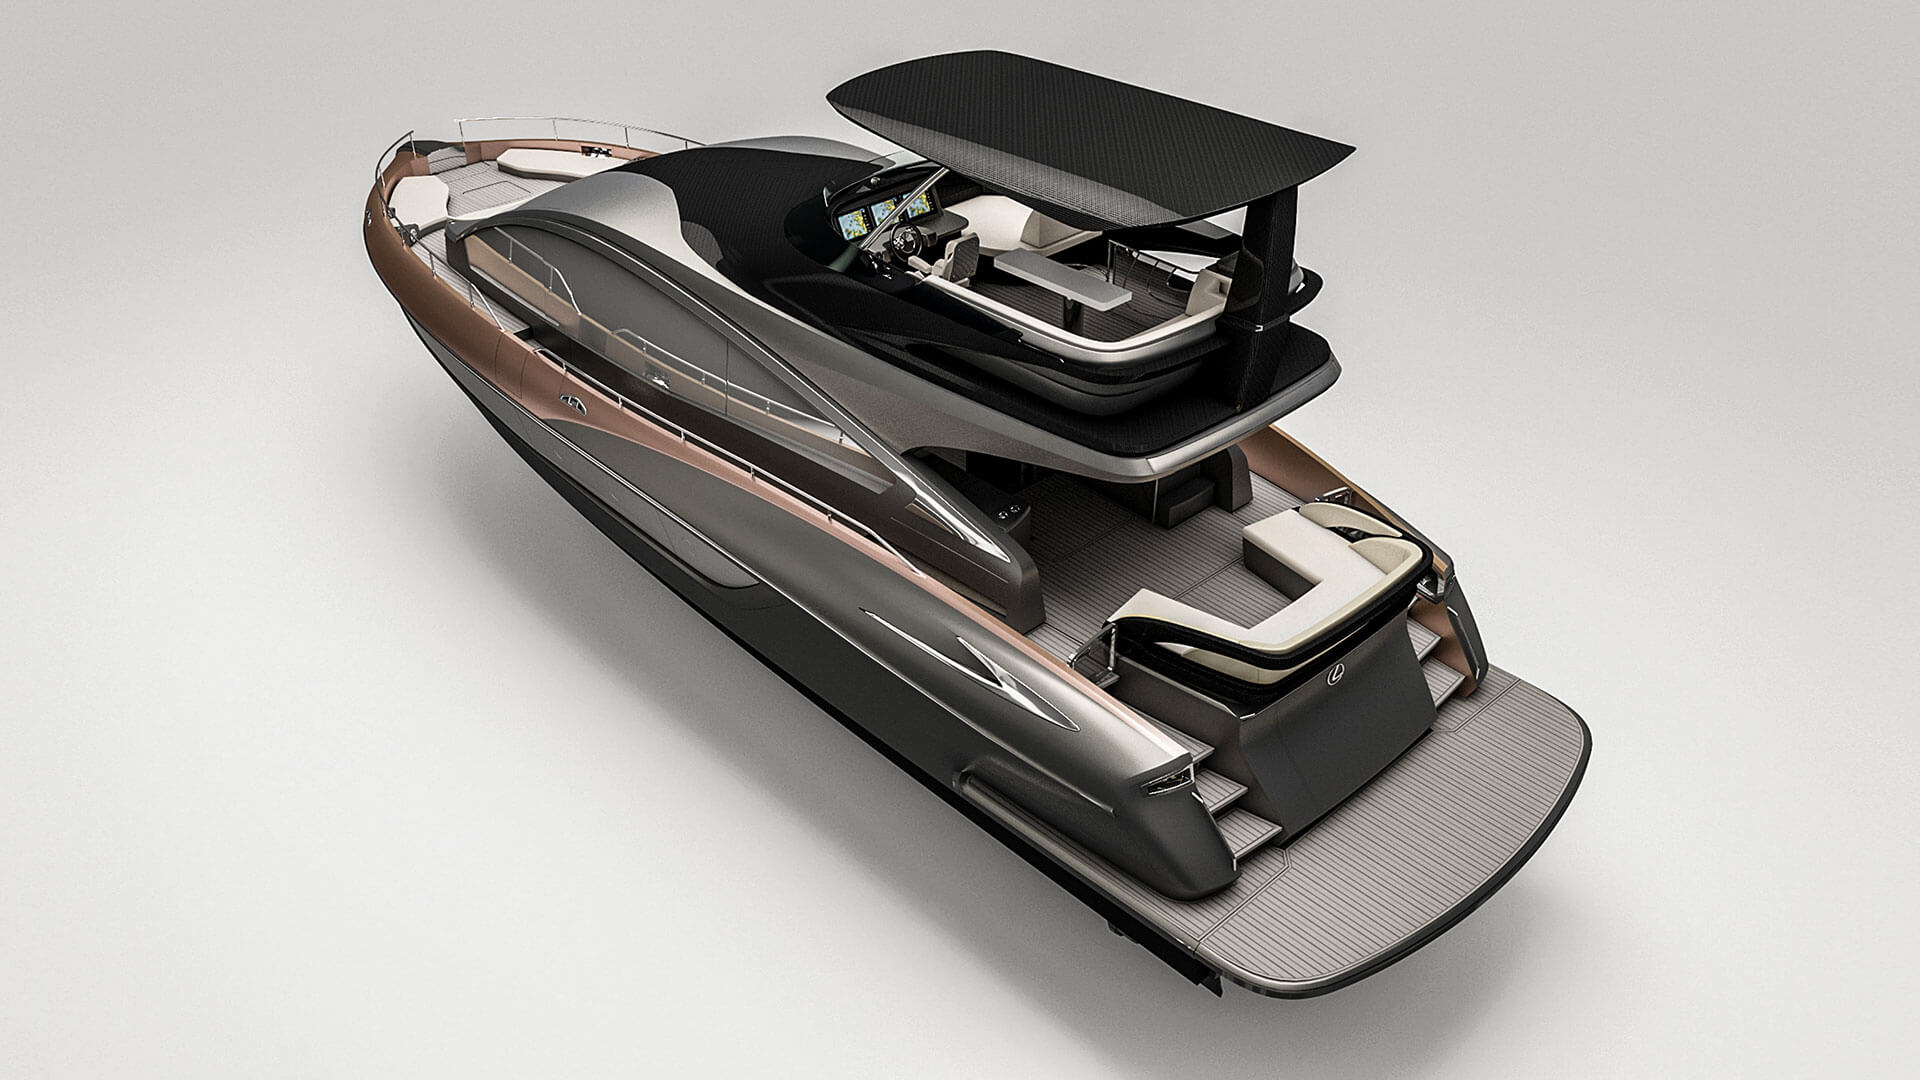 2019 lexus ly 650 luxury yacht gallery 12